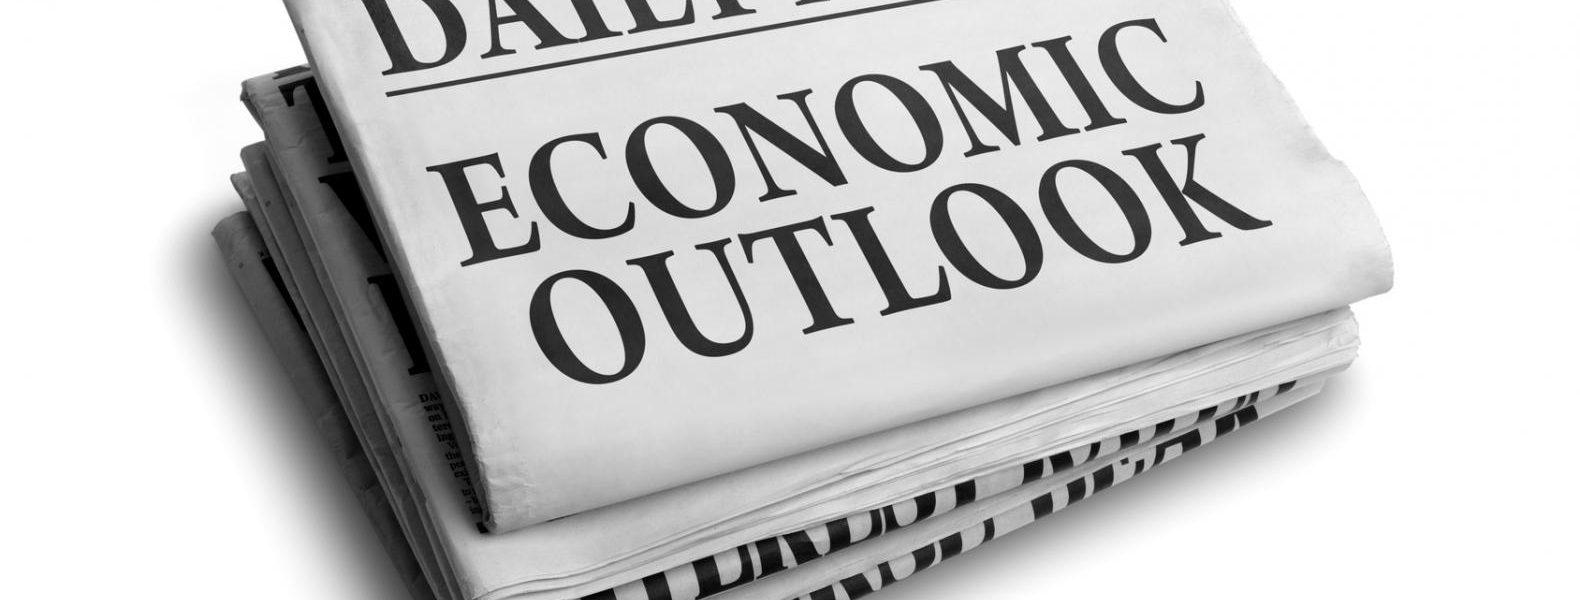 17 Companies Issued Profit Warnings in 2019 Alone - Kenyan ...